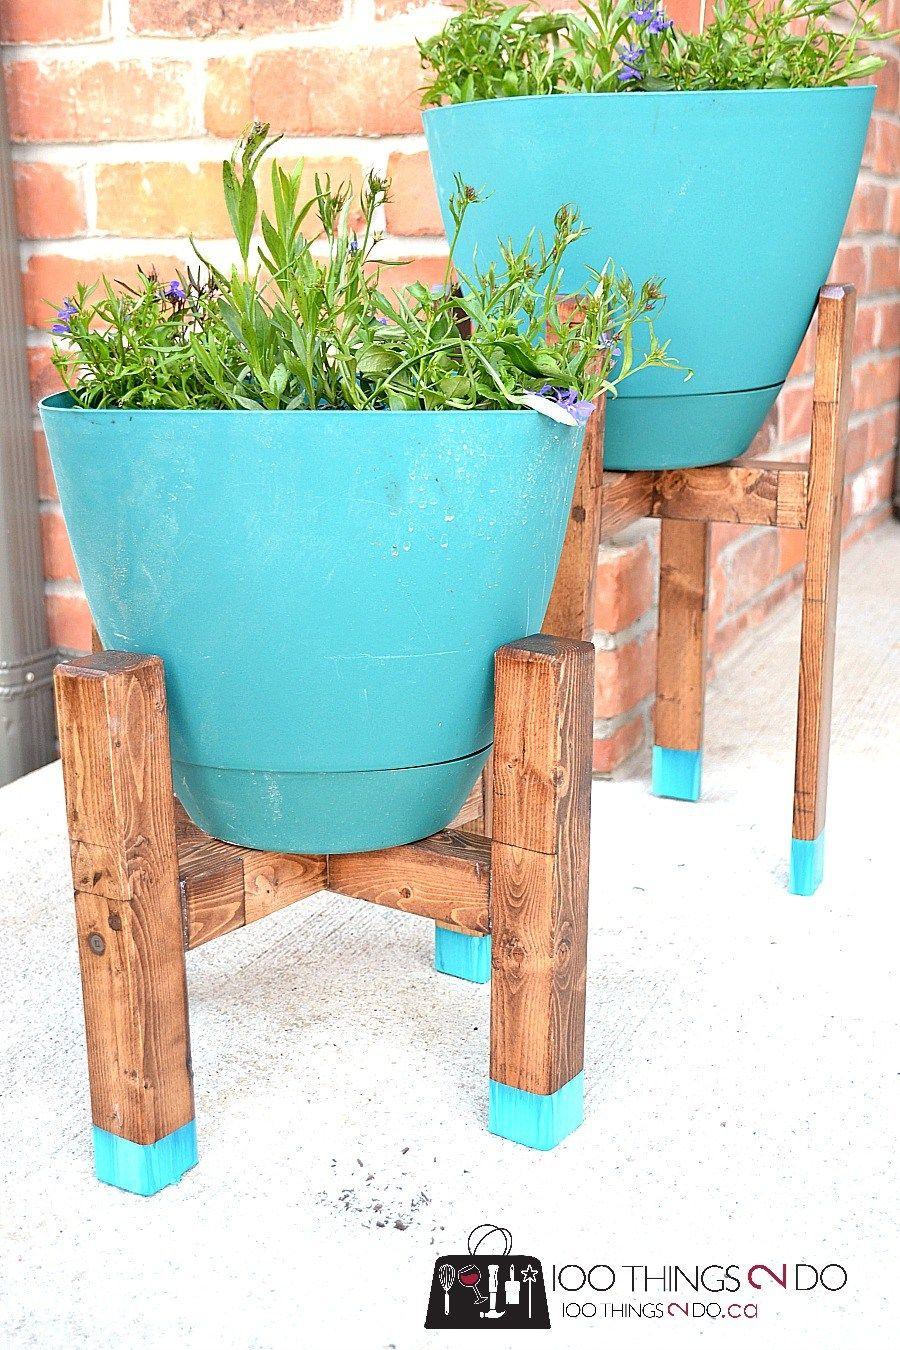 DIY Plant Stand - West Elm Knock-off